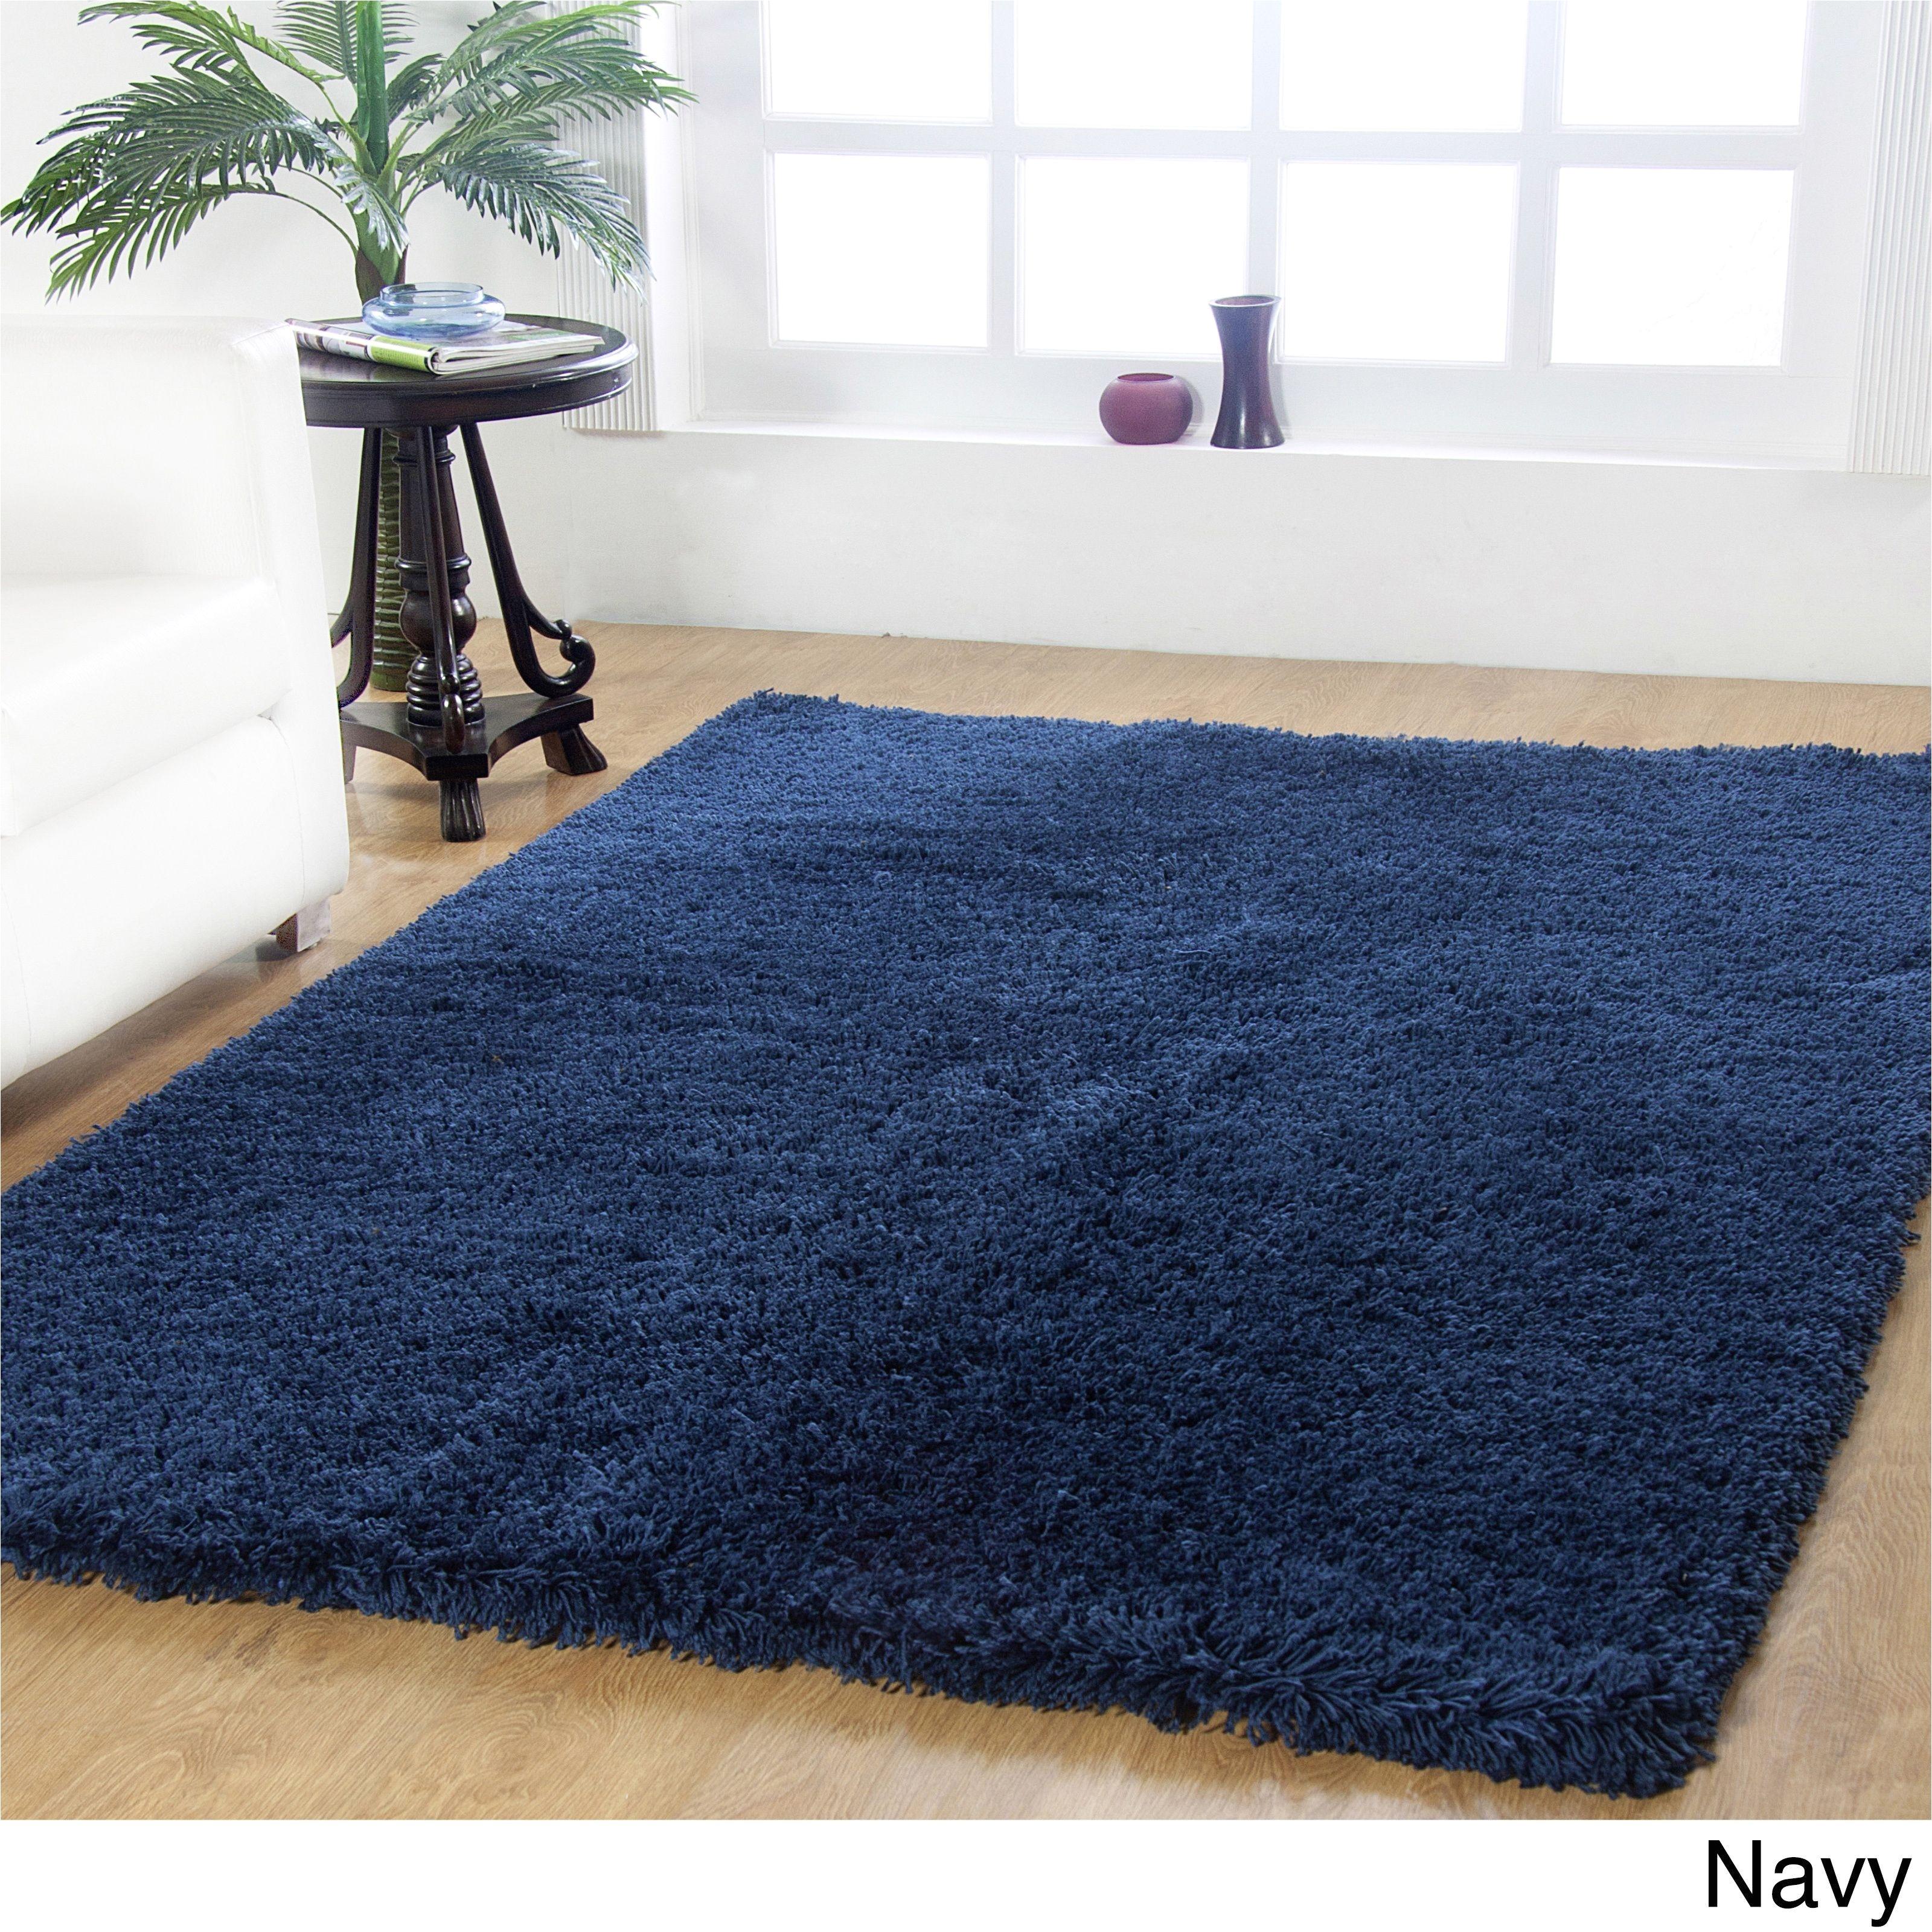 affinity home soft luxurious plush shag rug 4 x 6 navy blue size 4 x 6